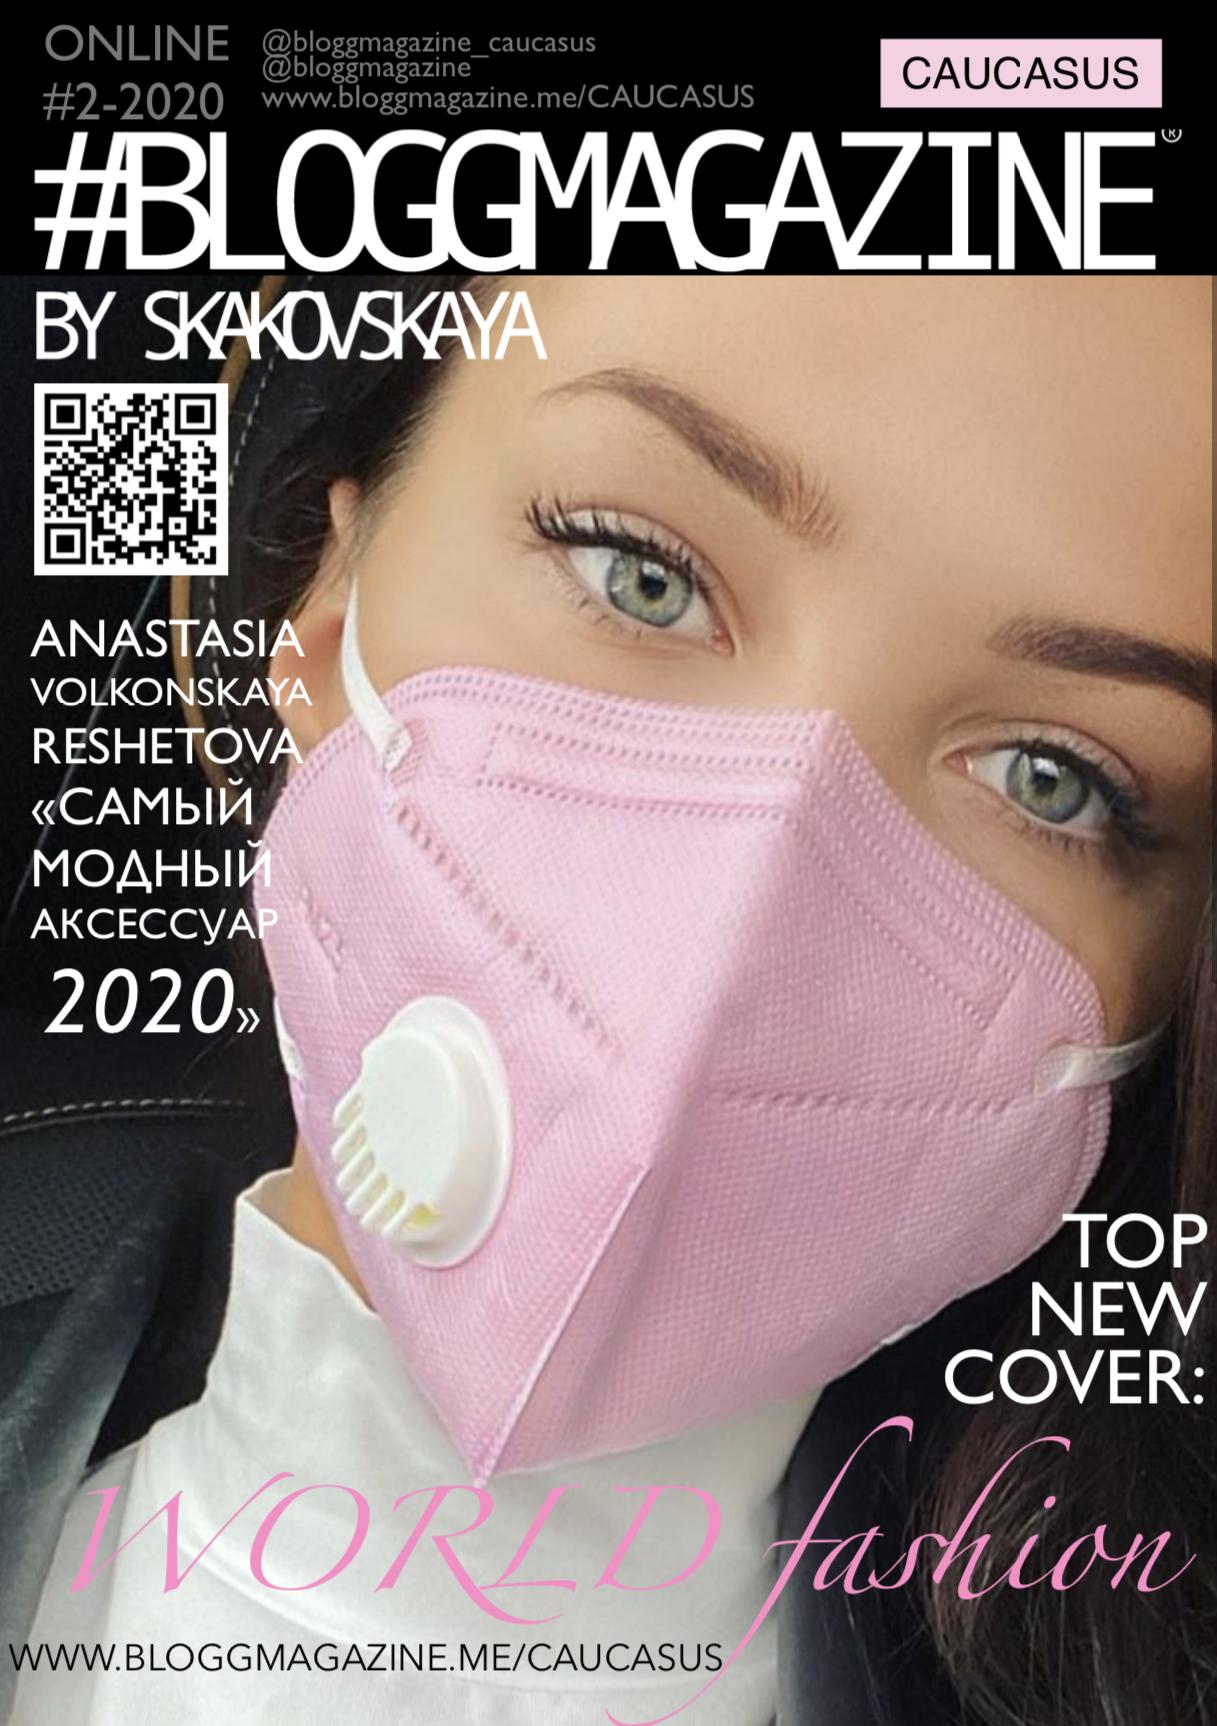 bloggmagazine_caucasus_online_reshetova_